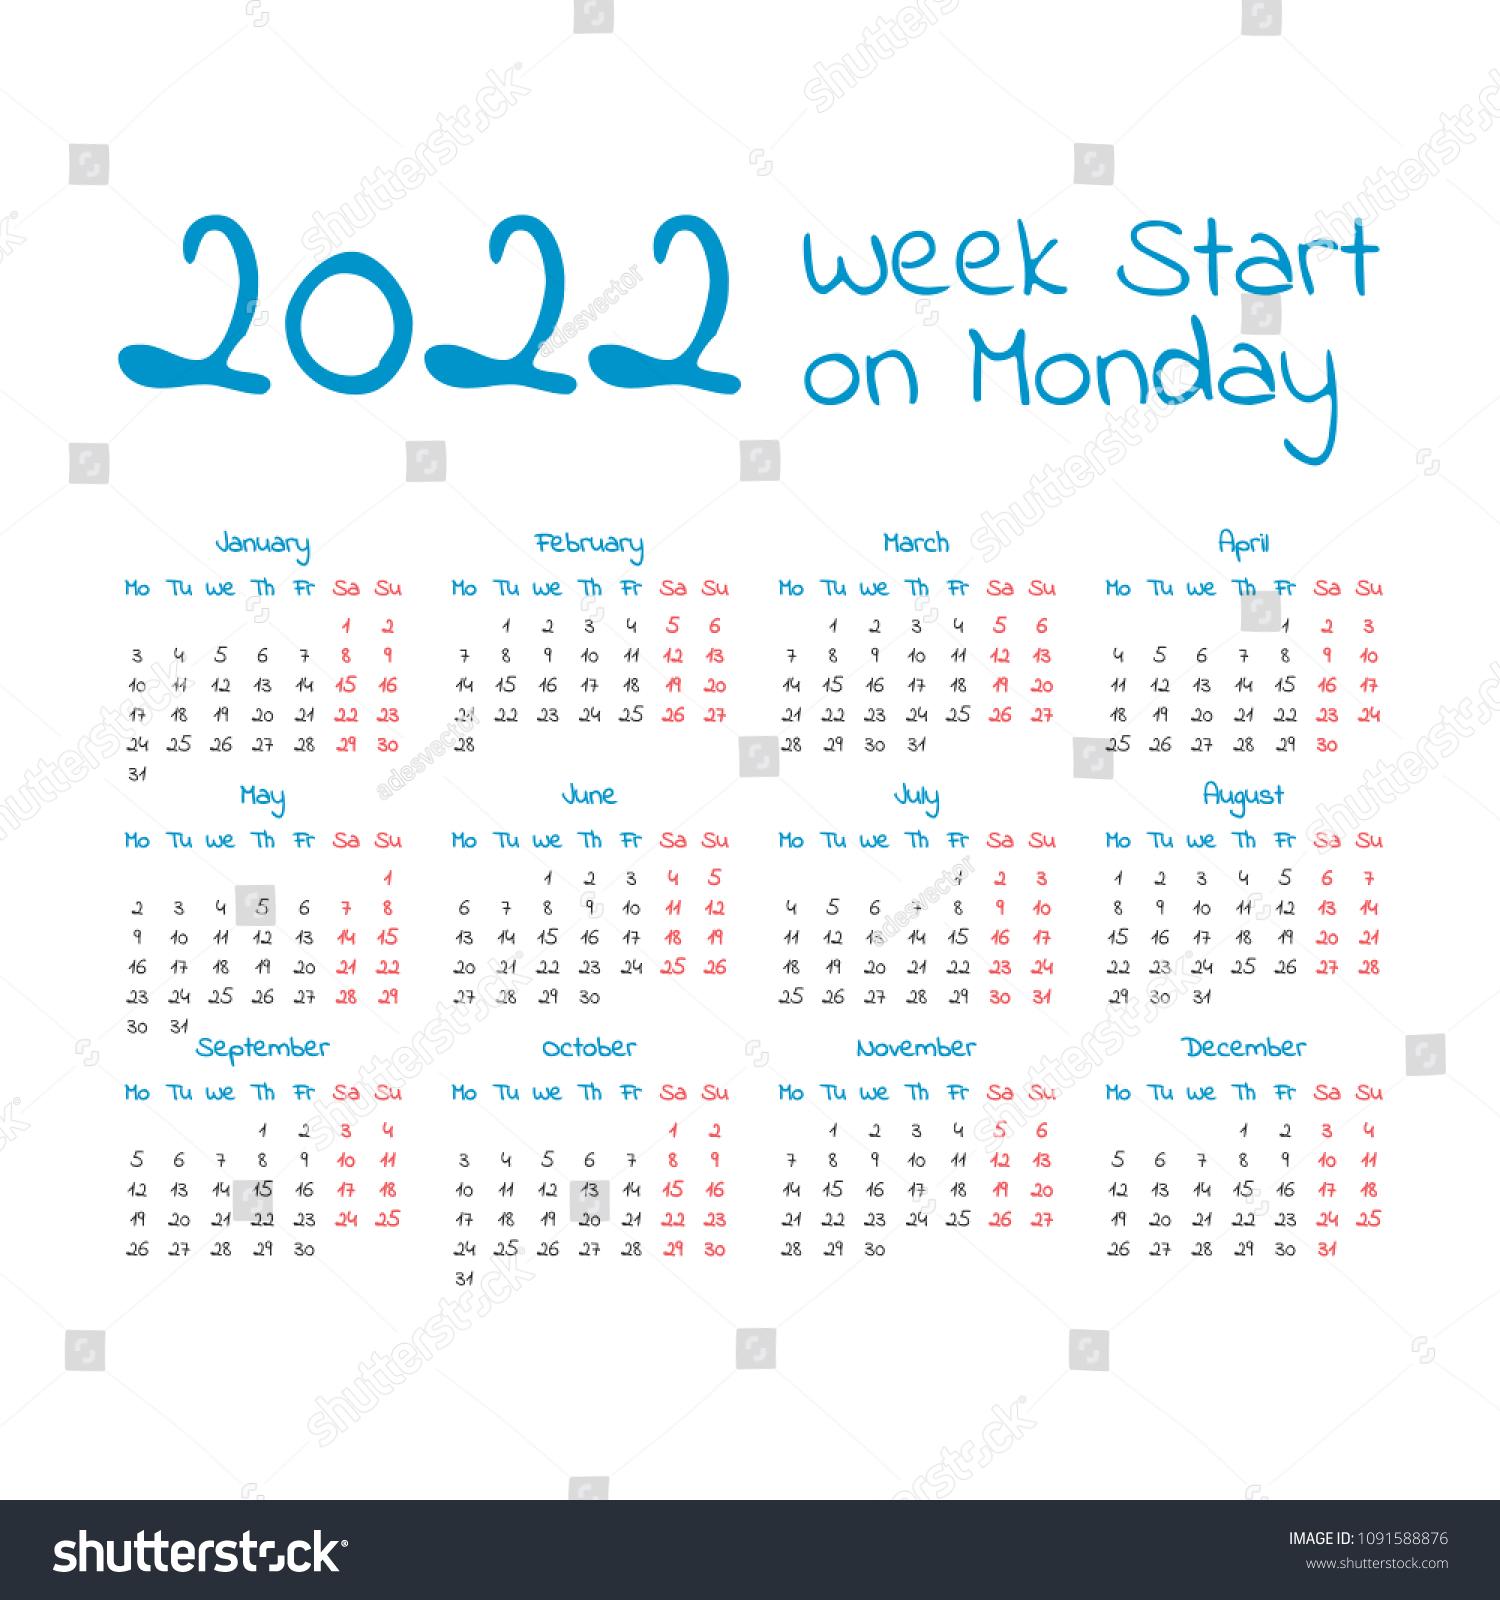 2022 Calendar Monday Start.2022 Calendar Week Start On Monday Stock Vector Royalty Free 1091588876